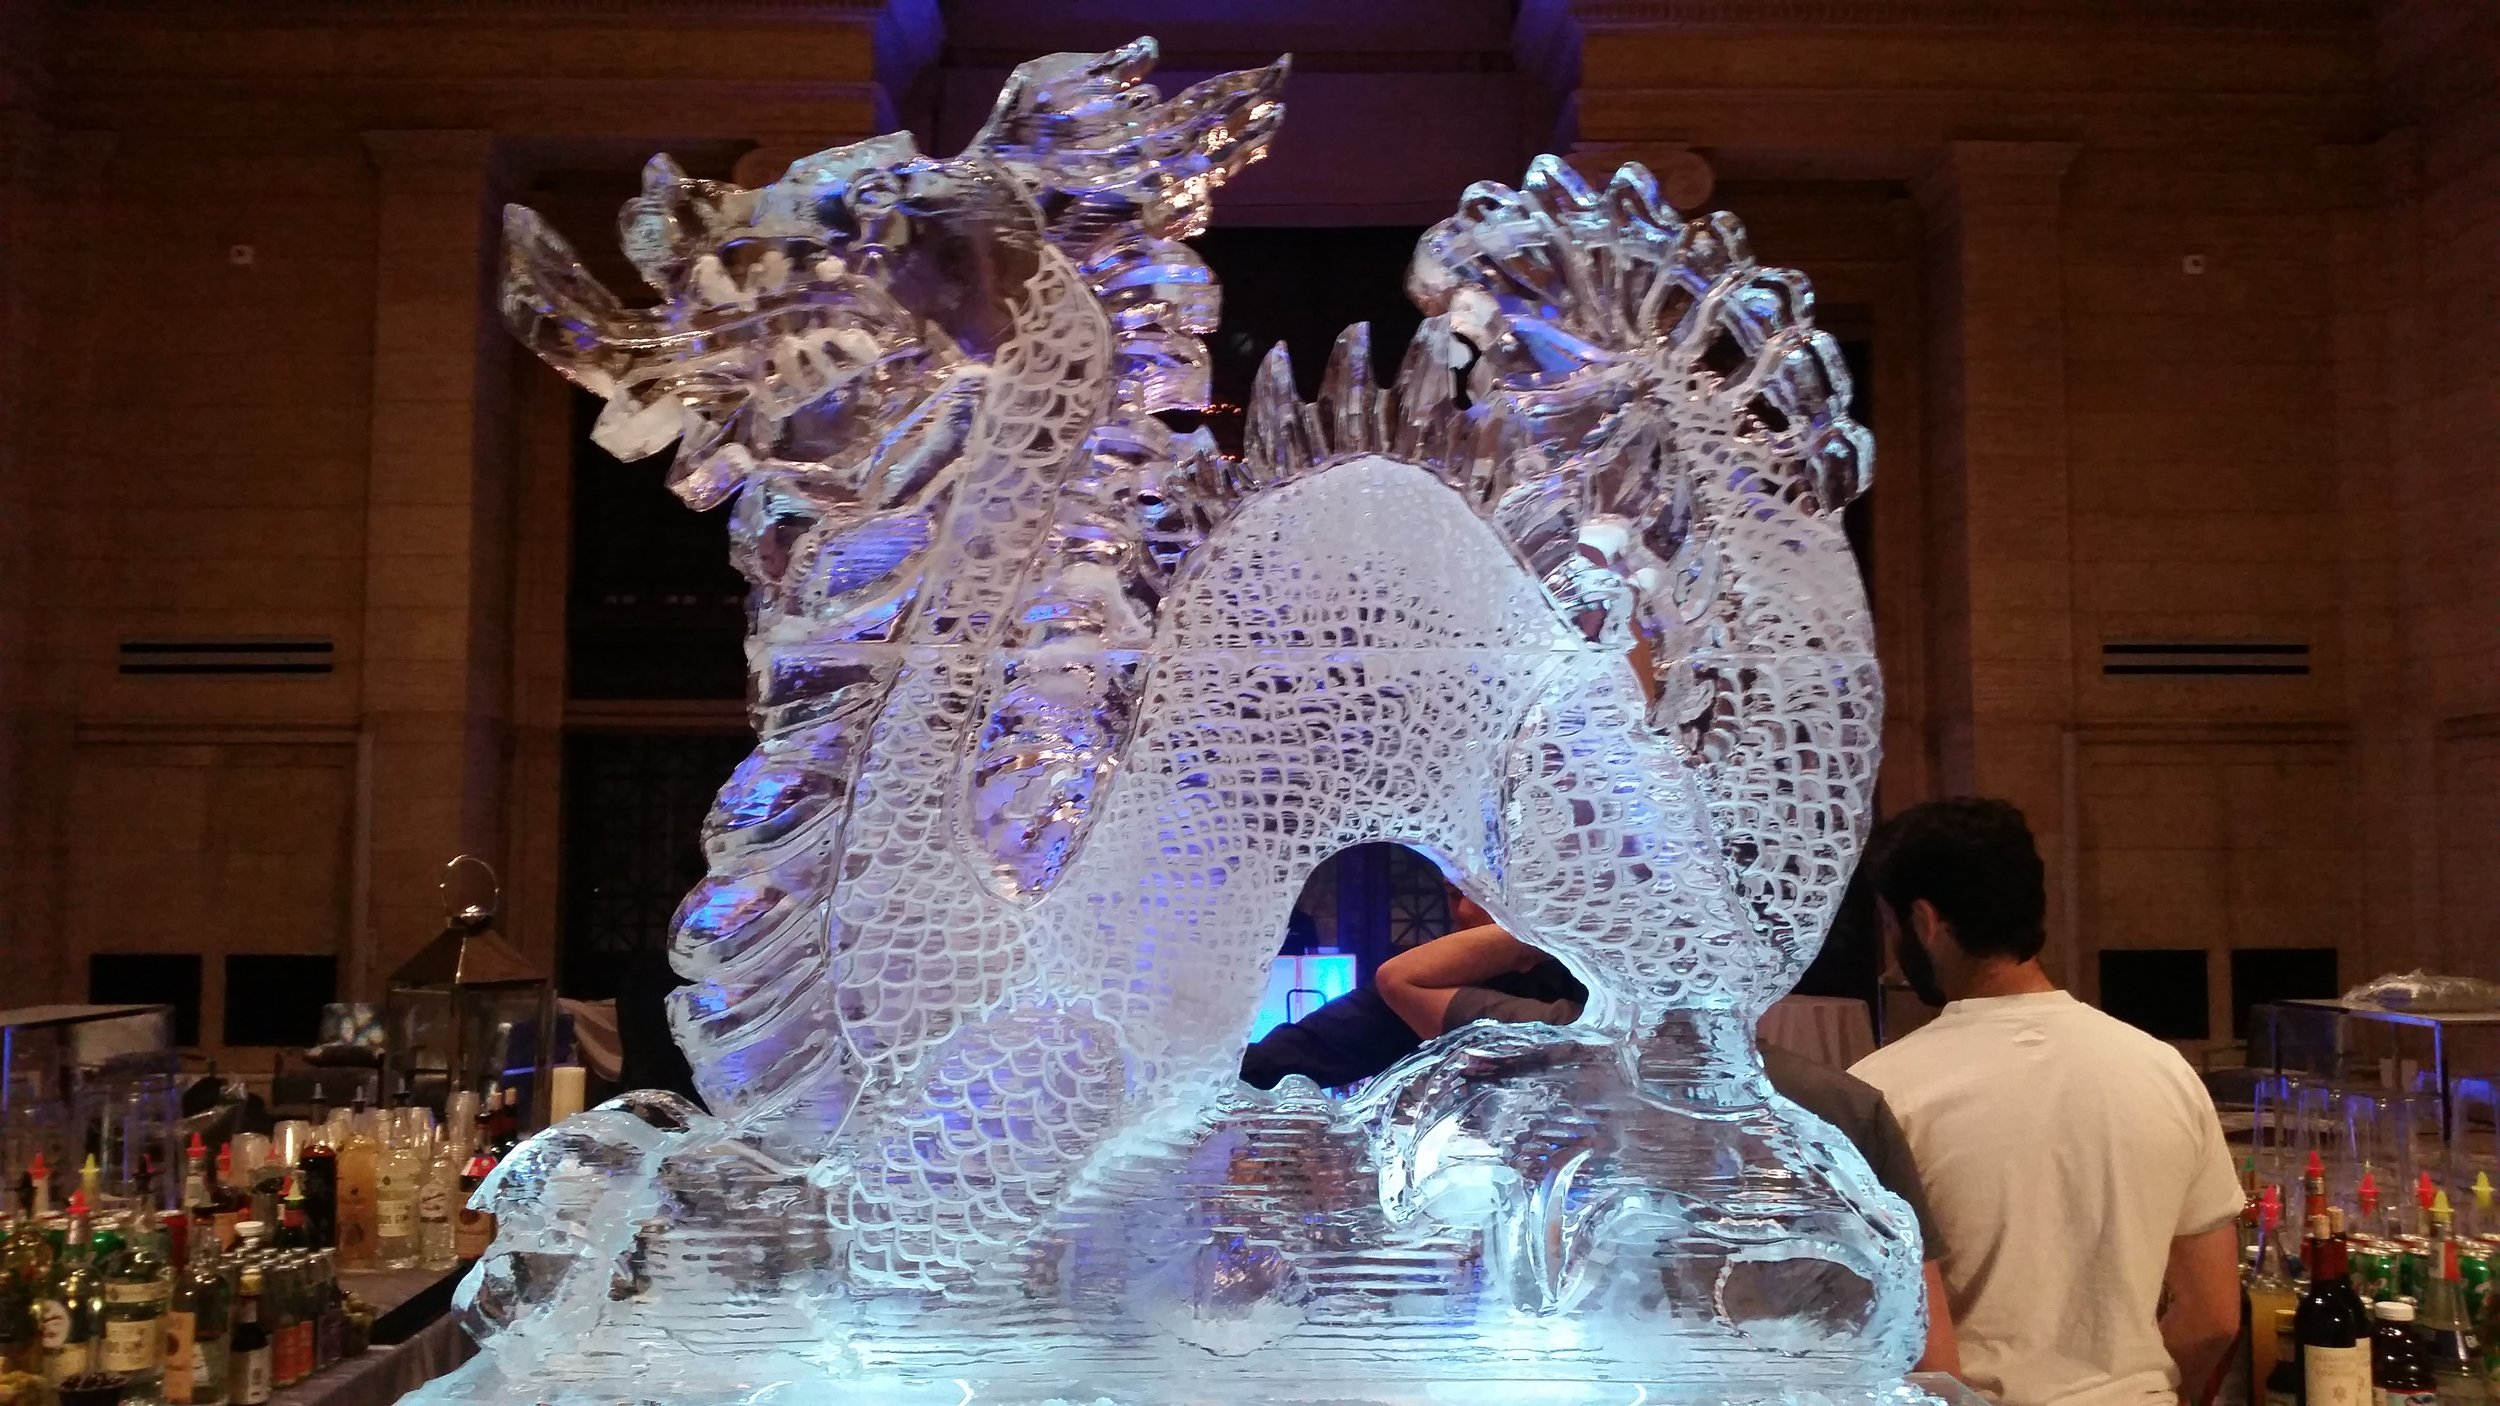 Themed Ice